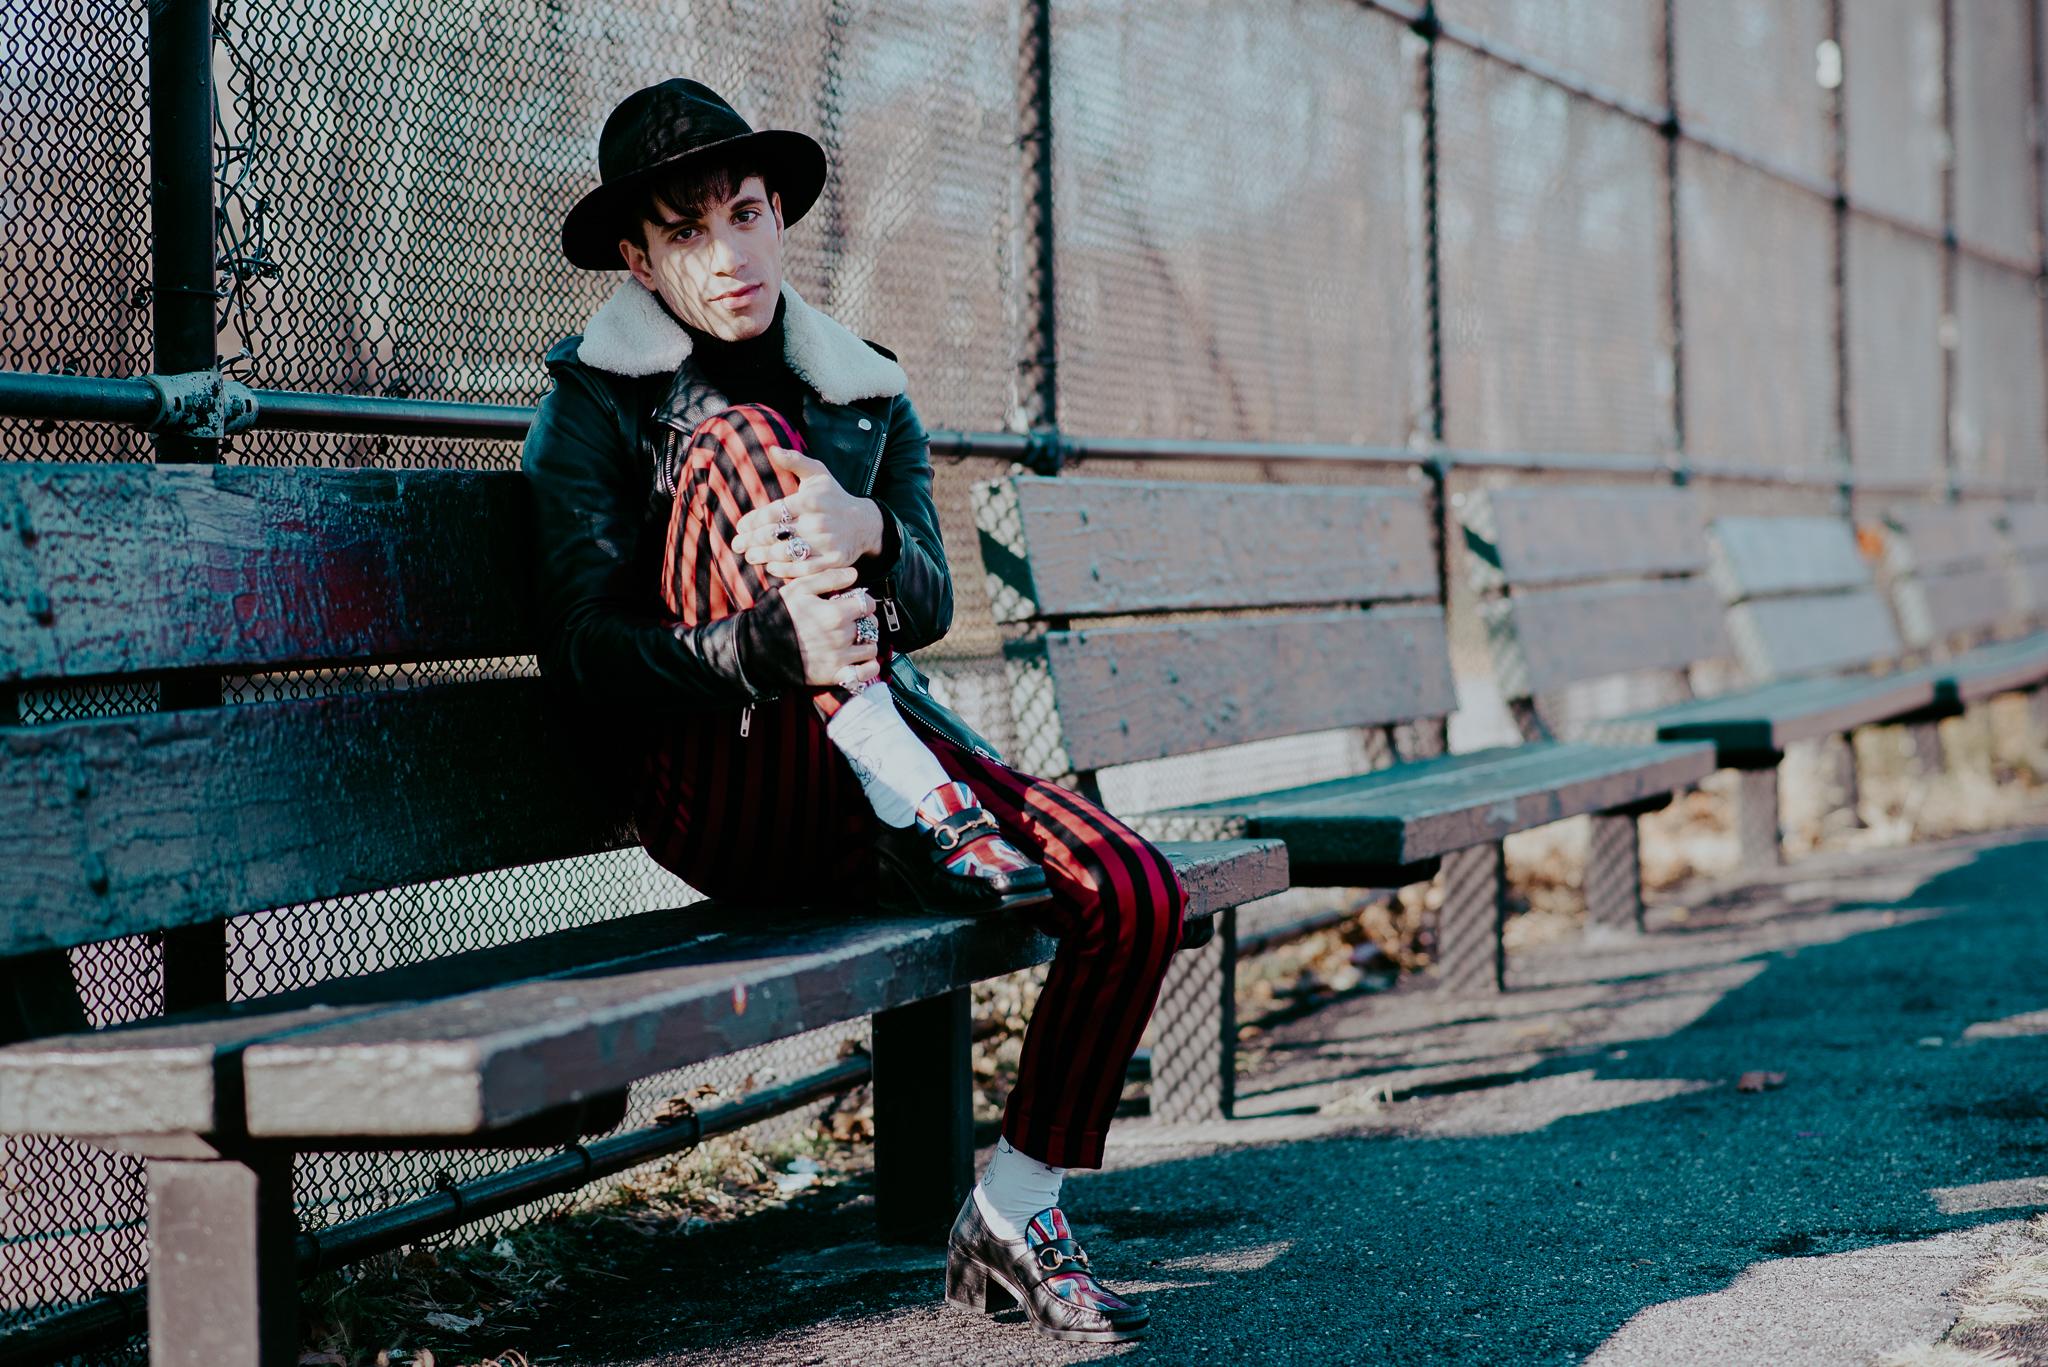 Sheare Brandon Sheer Williamsburg Brooklyn NYC